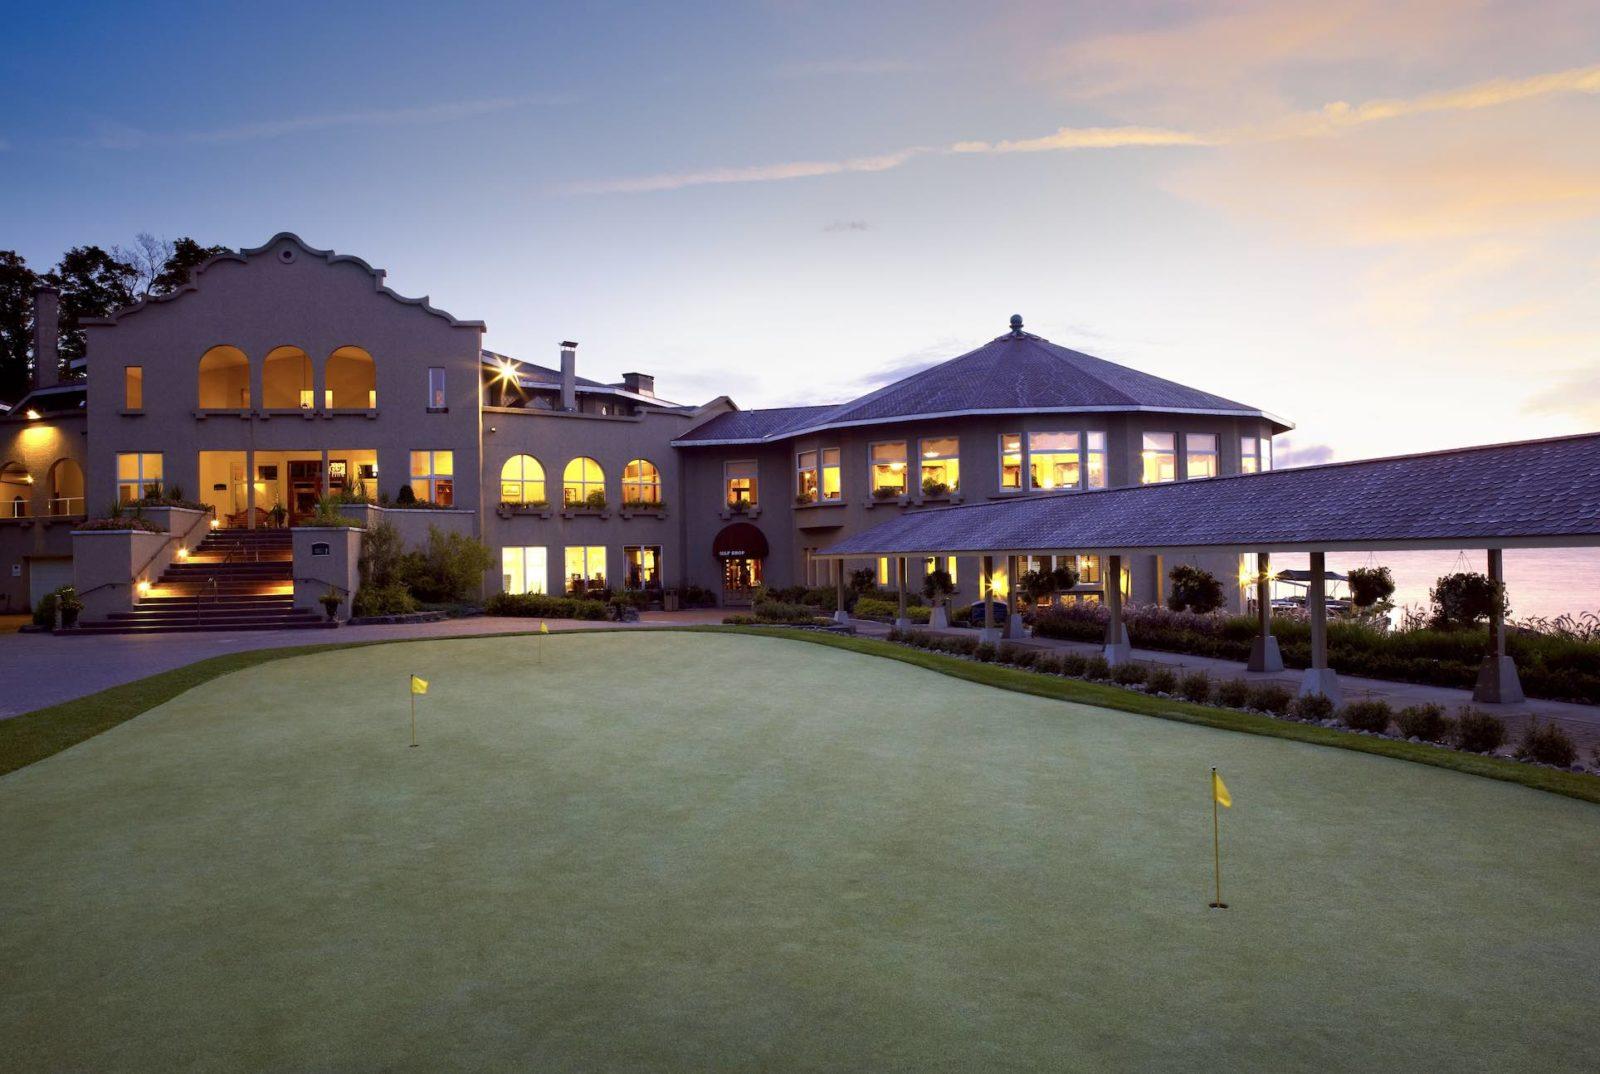 Bigwin Island club house at sunset